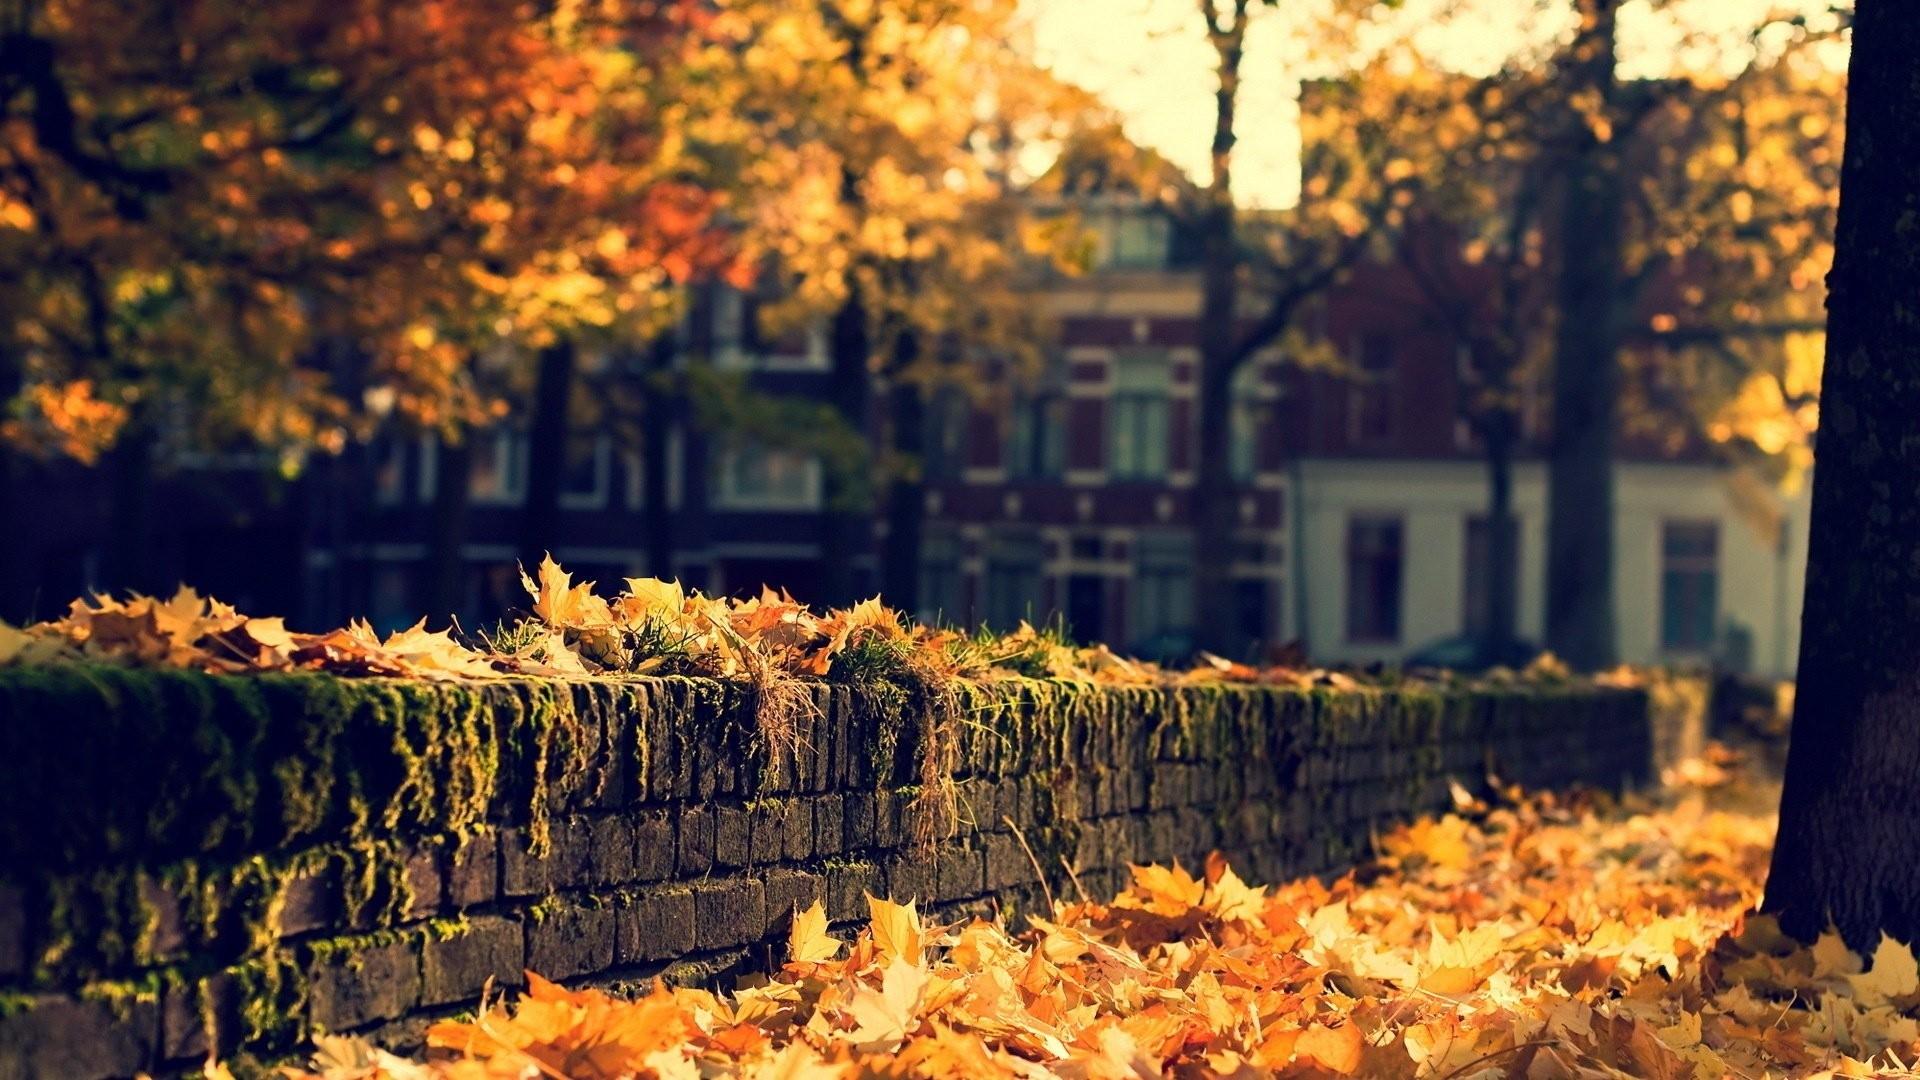 City Autumn Nature Street Beauty Hd Wallpapers – 1920×1080